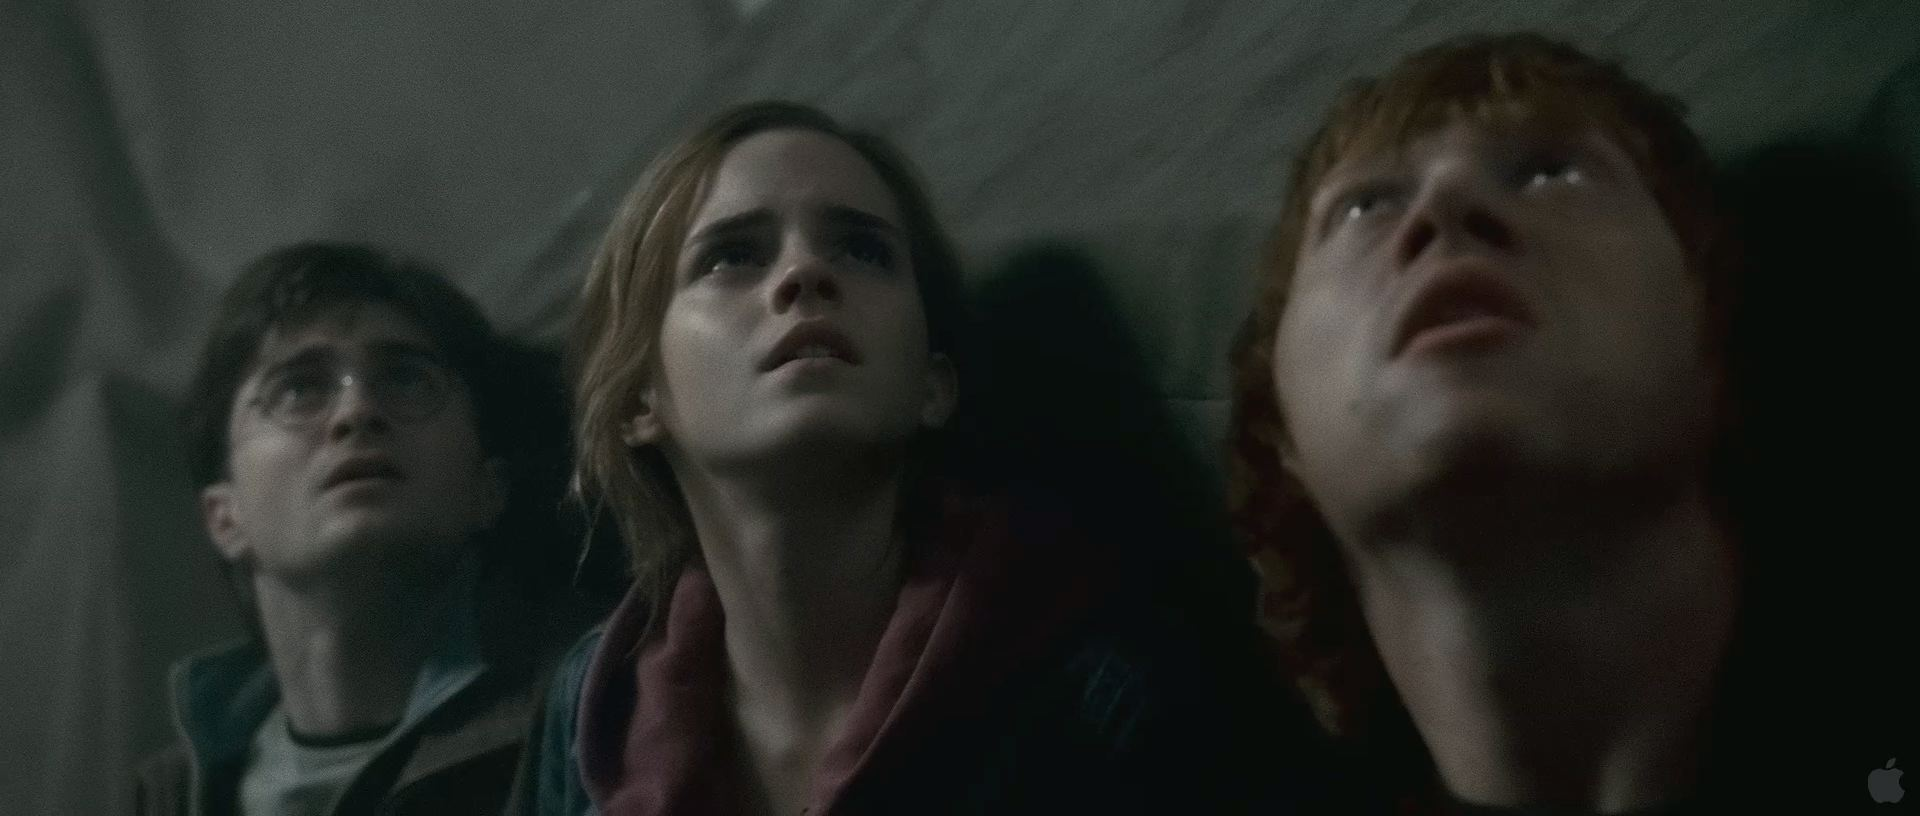 Harry Potter BlogHogwarts HP7 2 Trailer 19